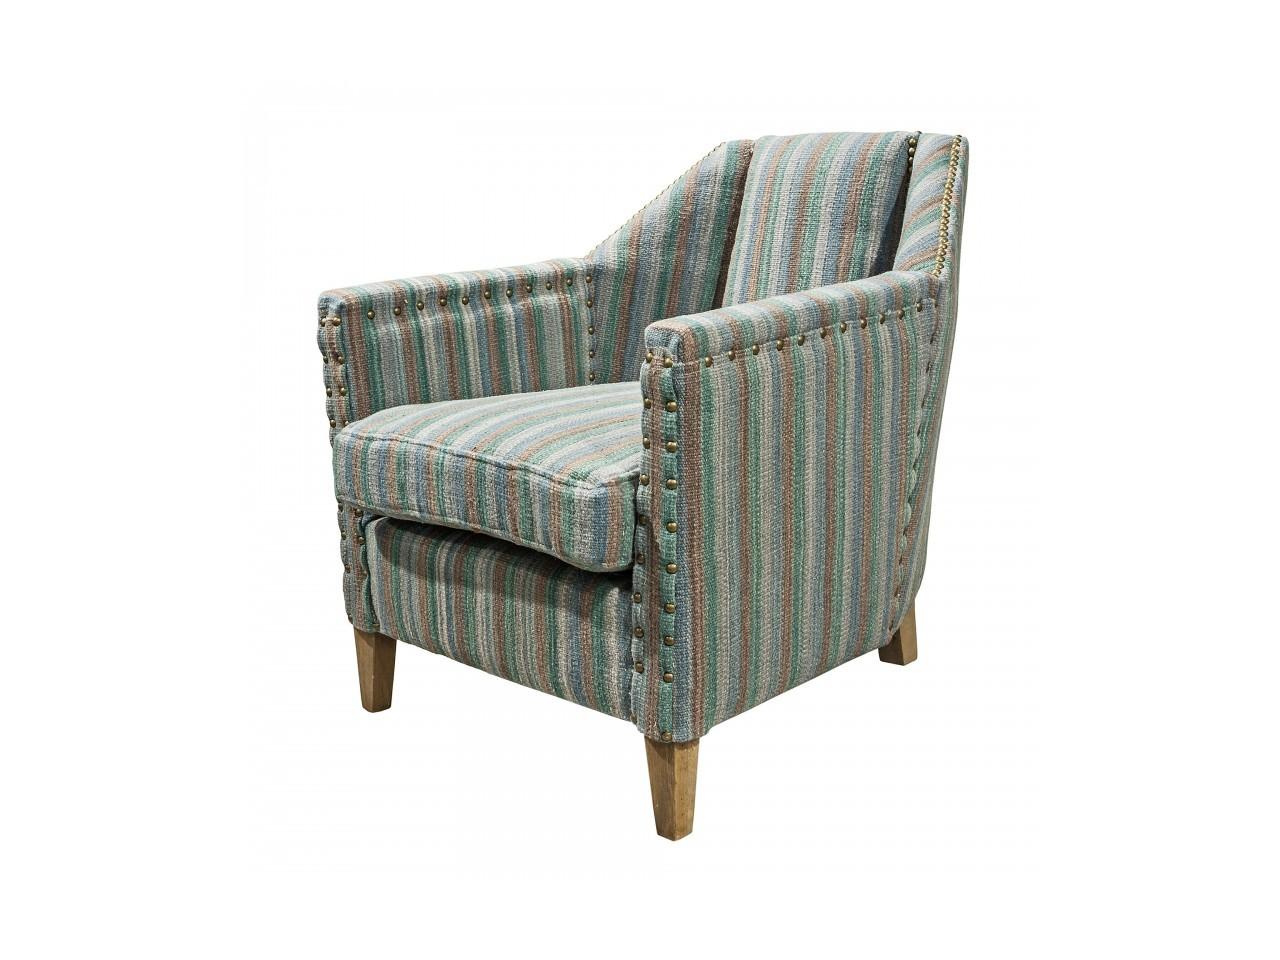 Кресло ДжорджИнтерьерные кресла<br><br><br>Material: Текстиль<br>Width см: 61<br>Depth см: 71<br>Height см: 69